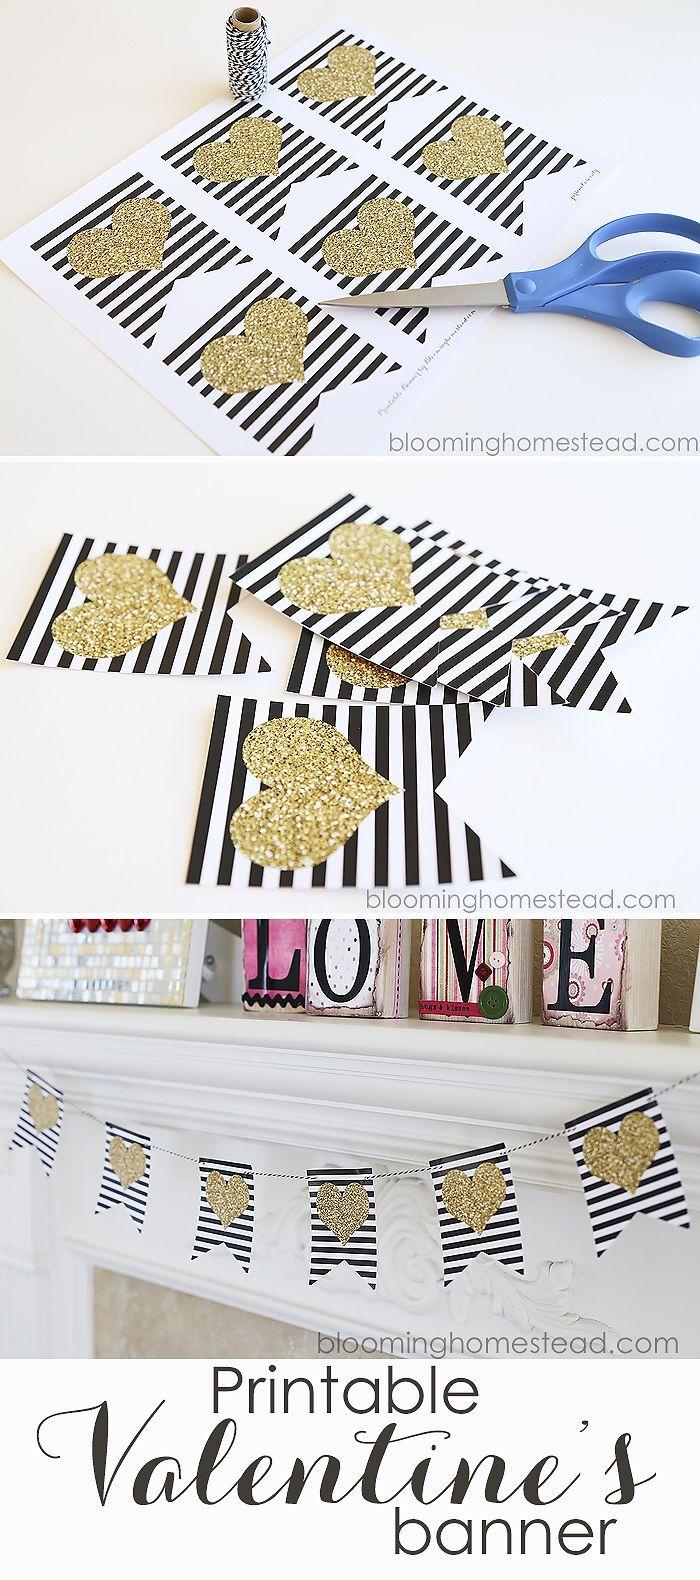 Pretty free printable Valentine's Banner. Love this!